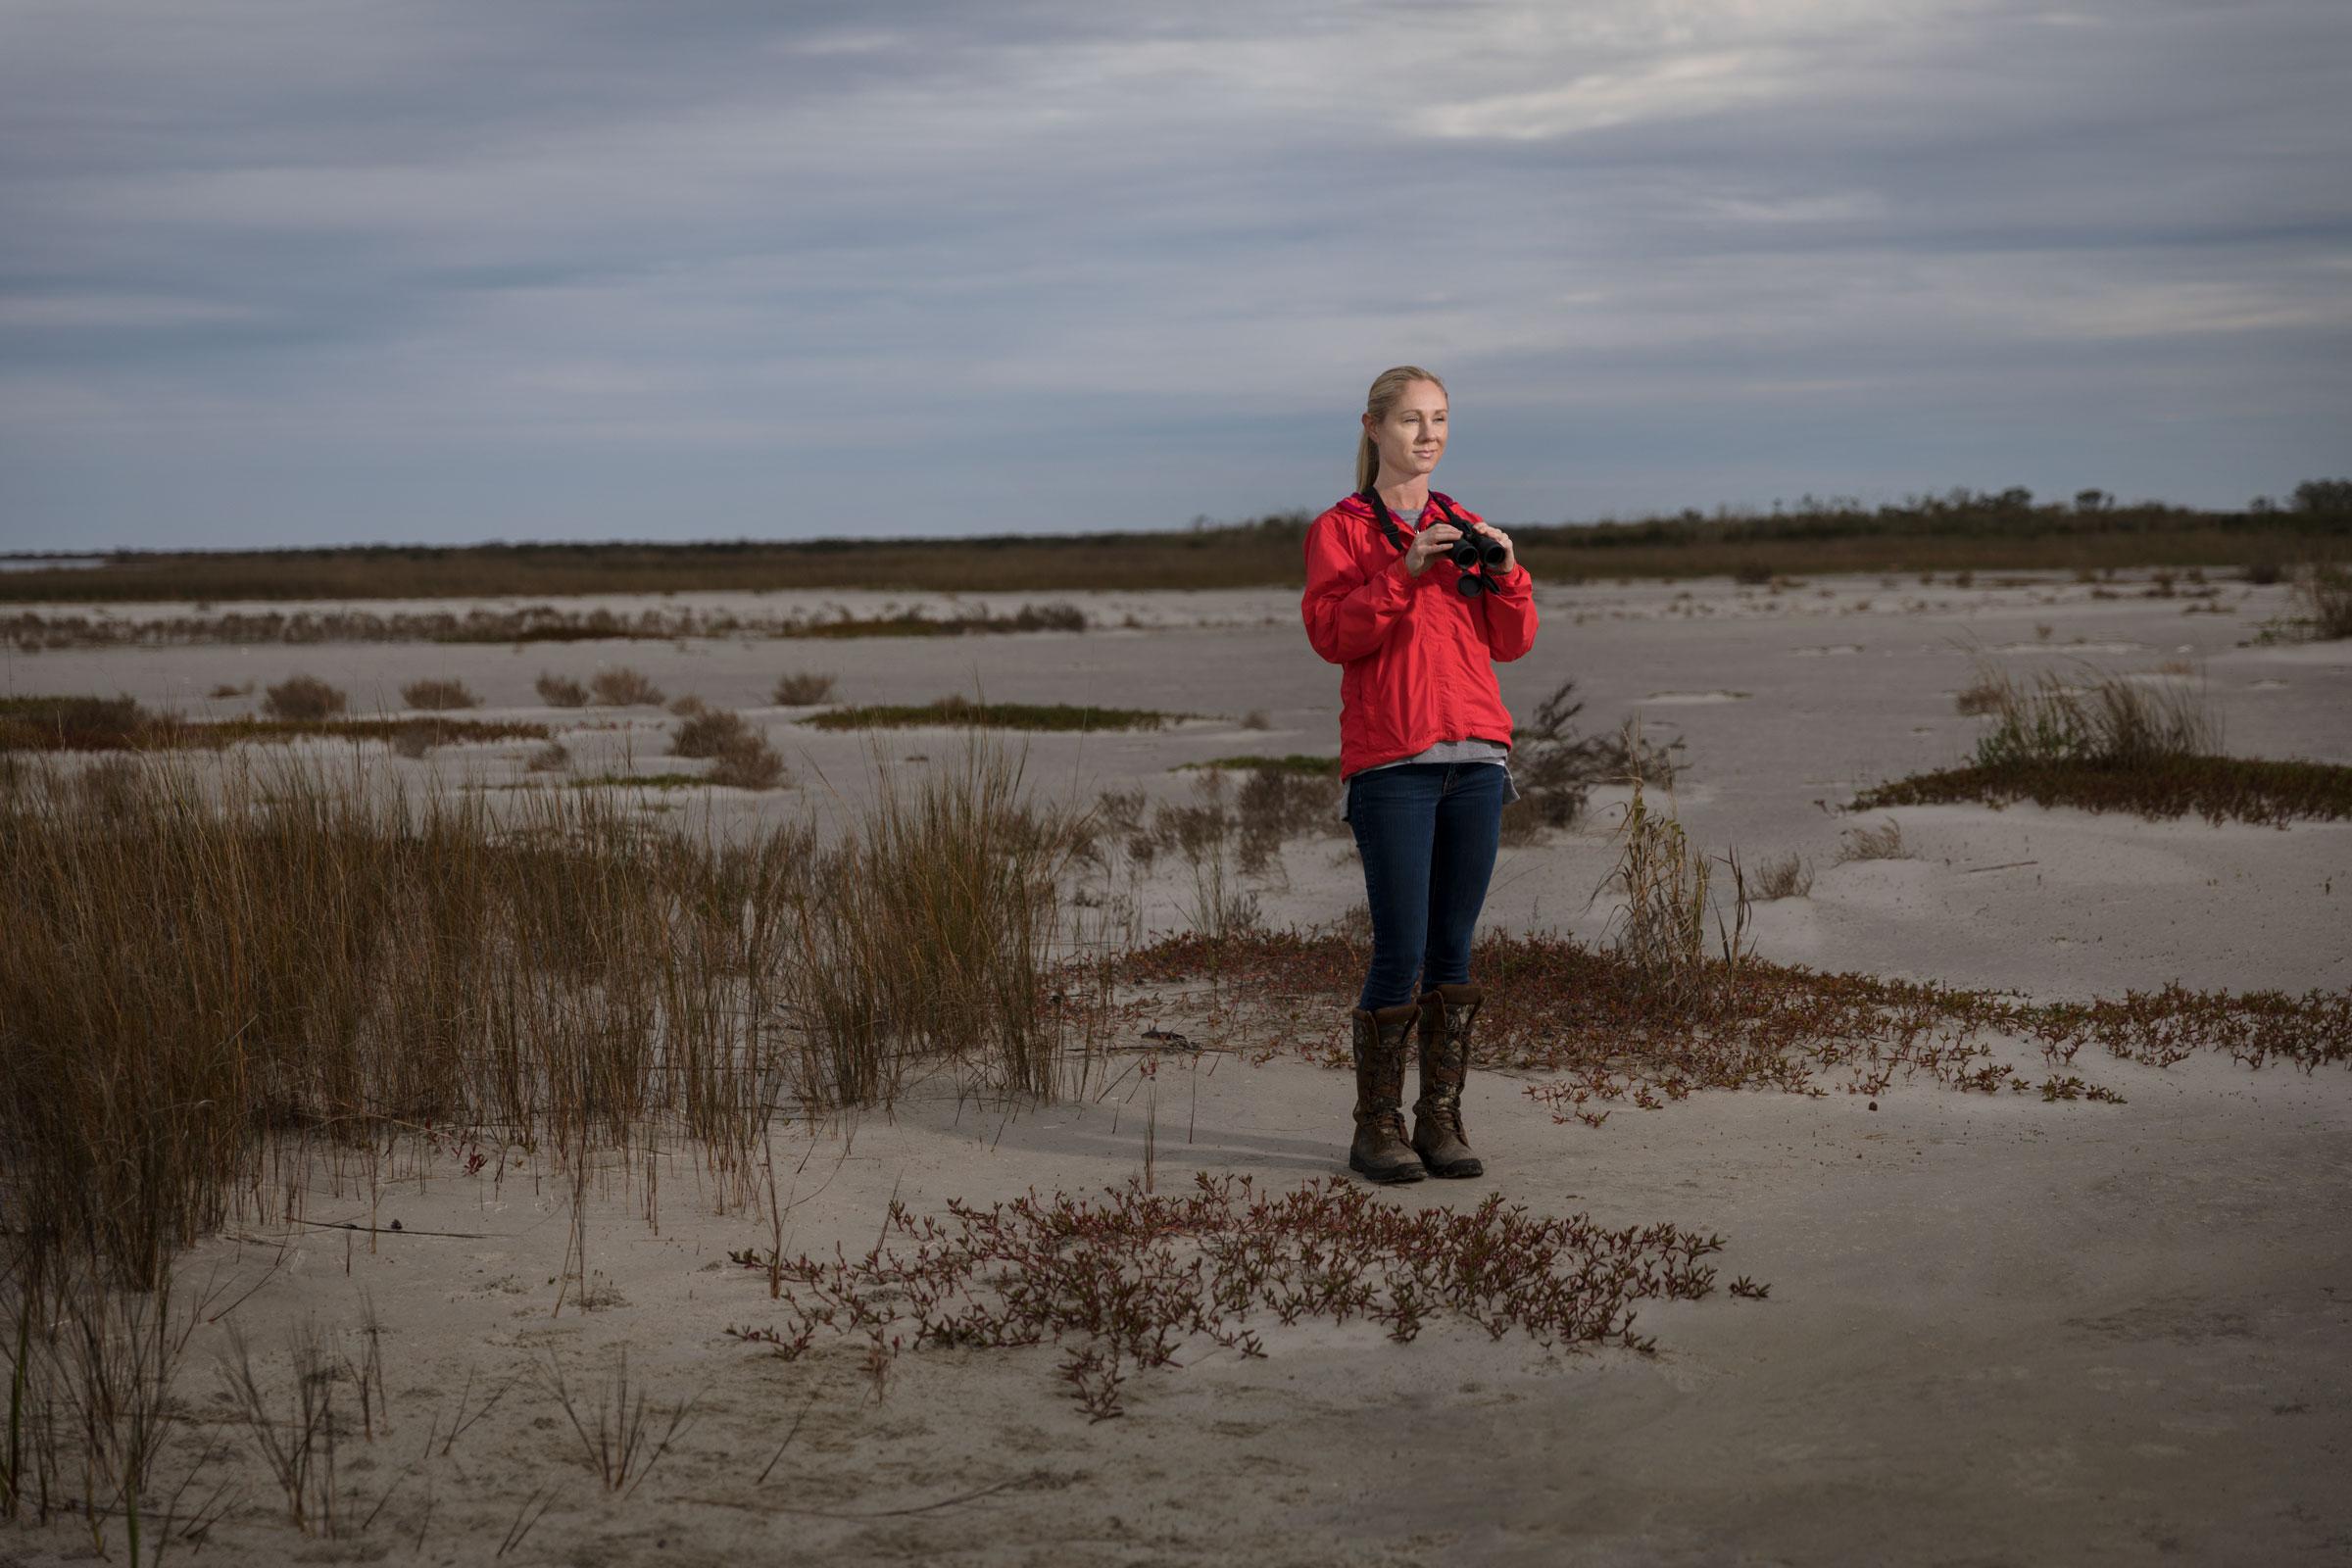 Kara Lankford spearheaded Audubon's new report. Mac Stone